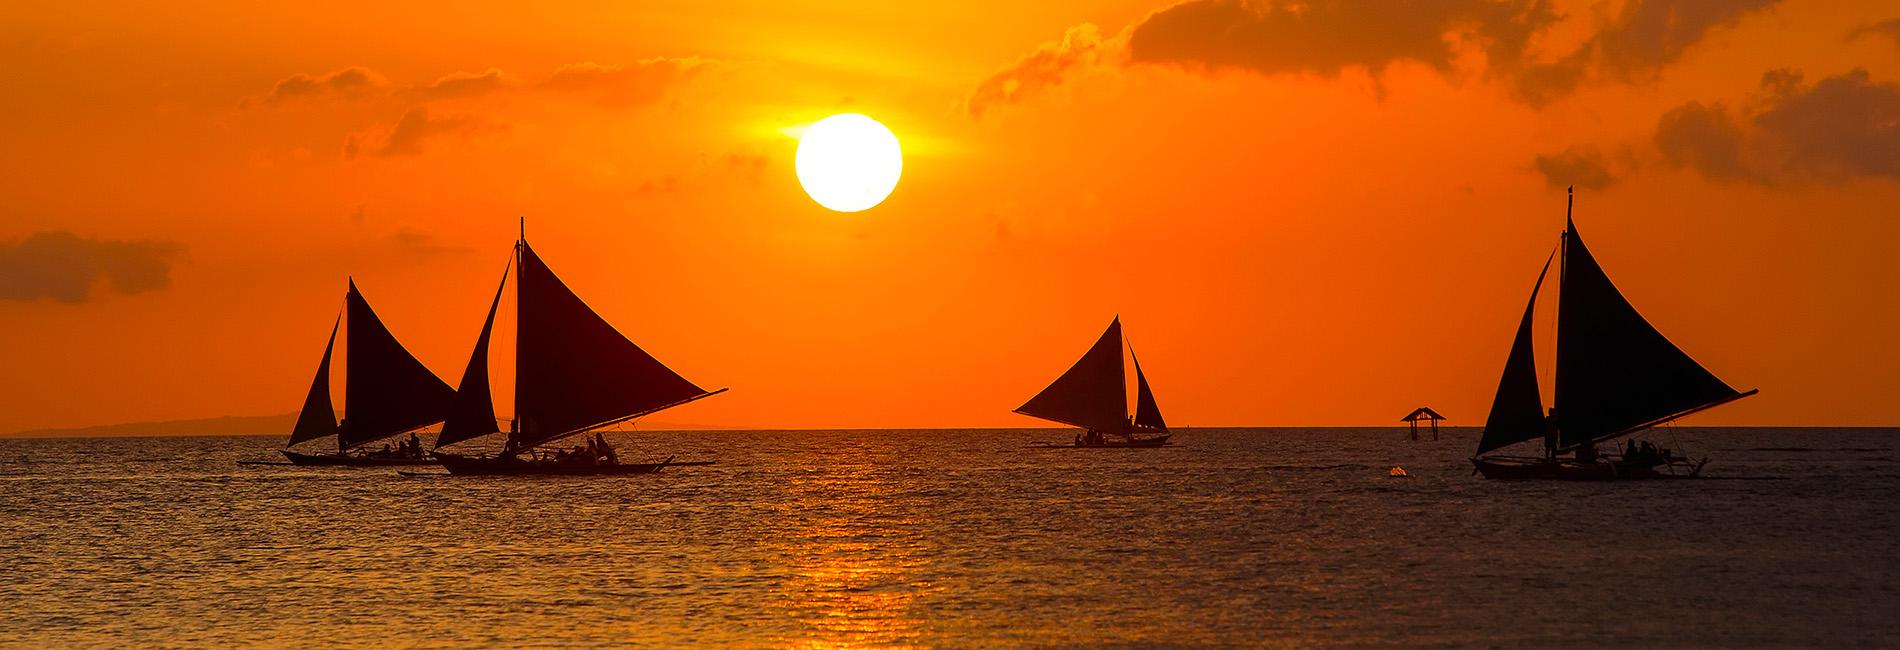 Boracay Island Sunset Cruise by Paraw